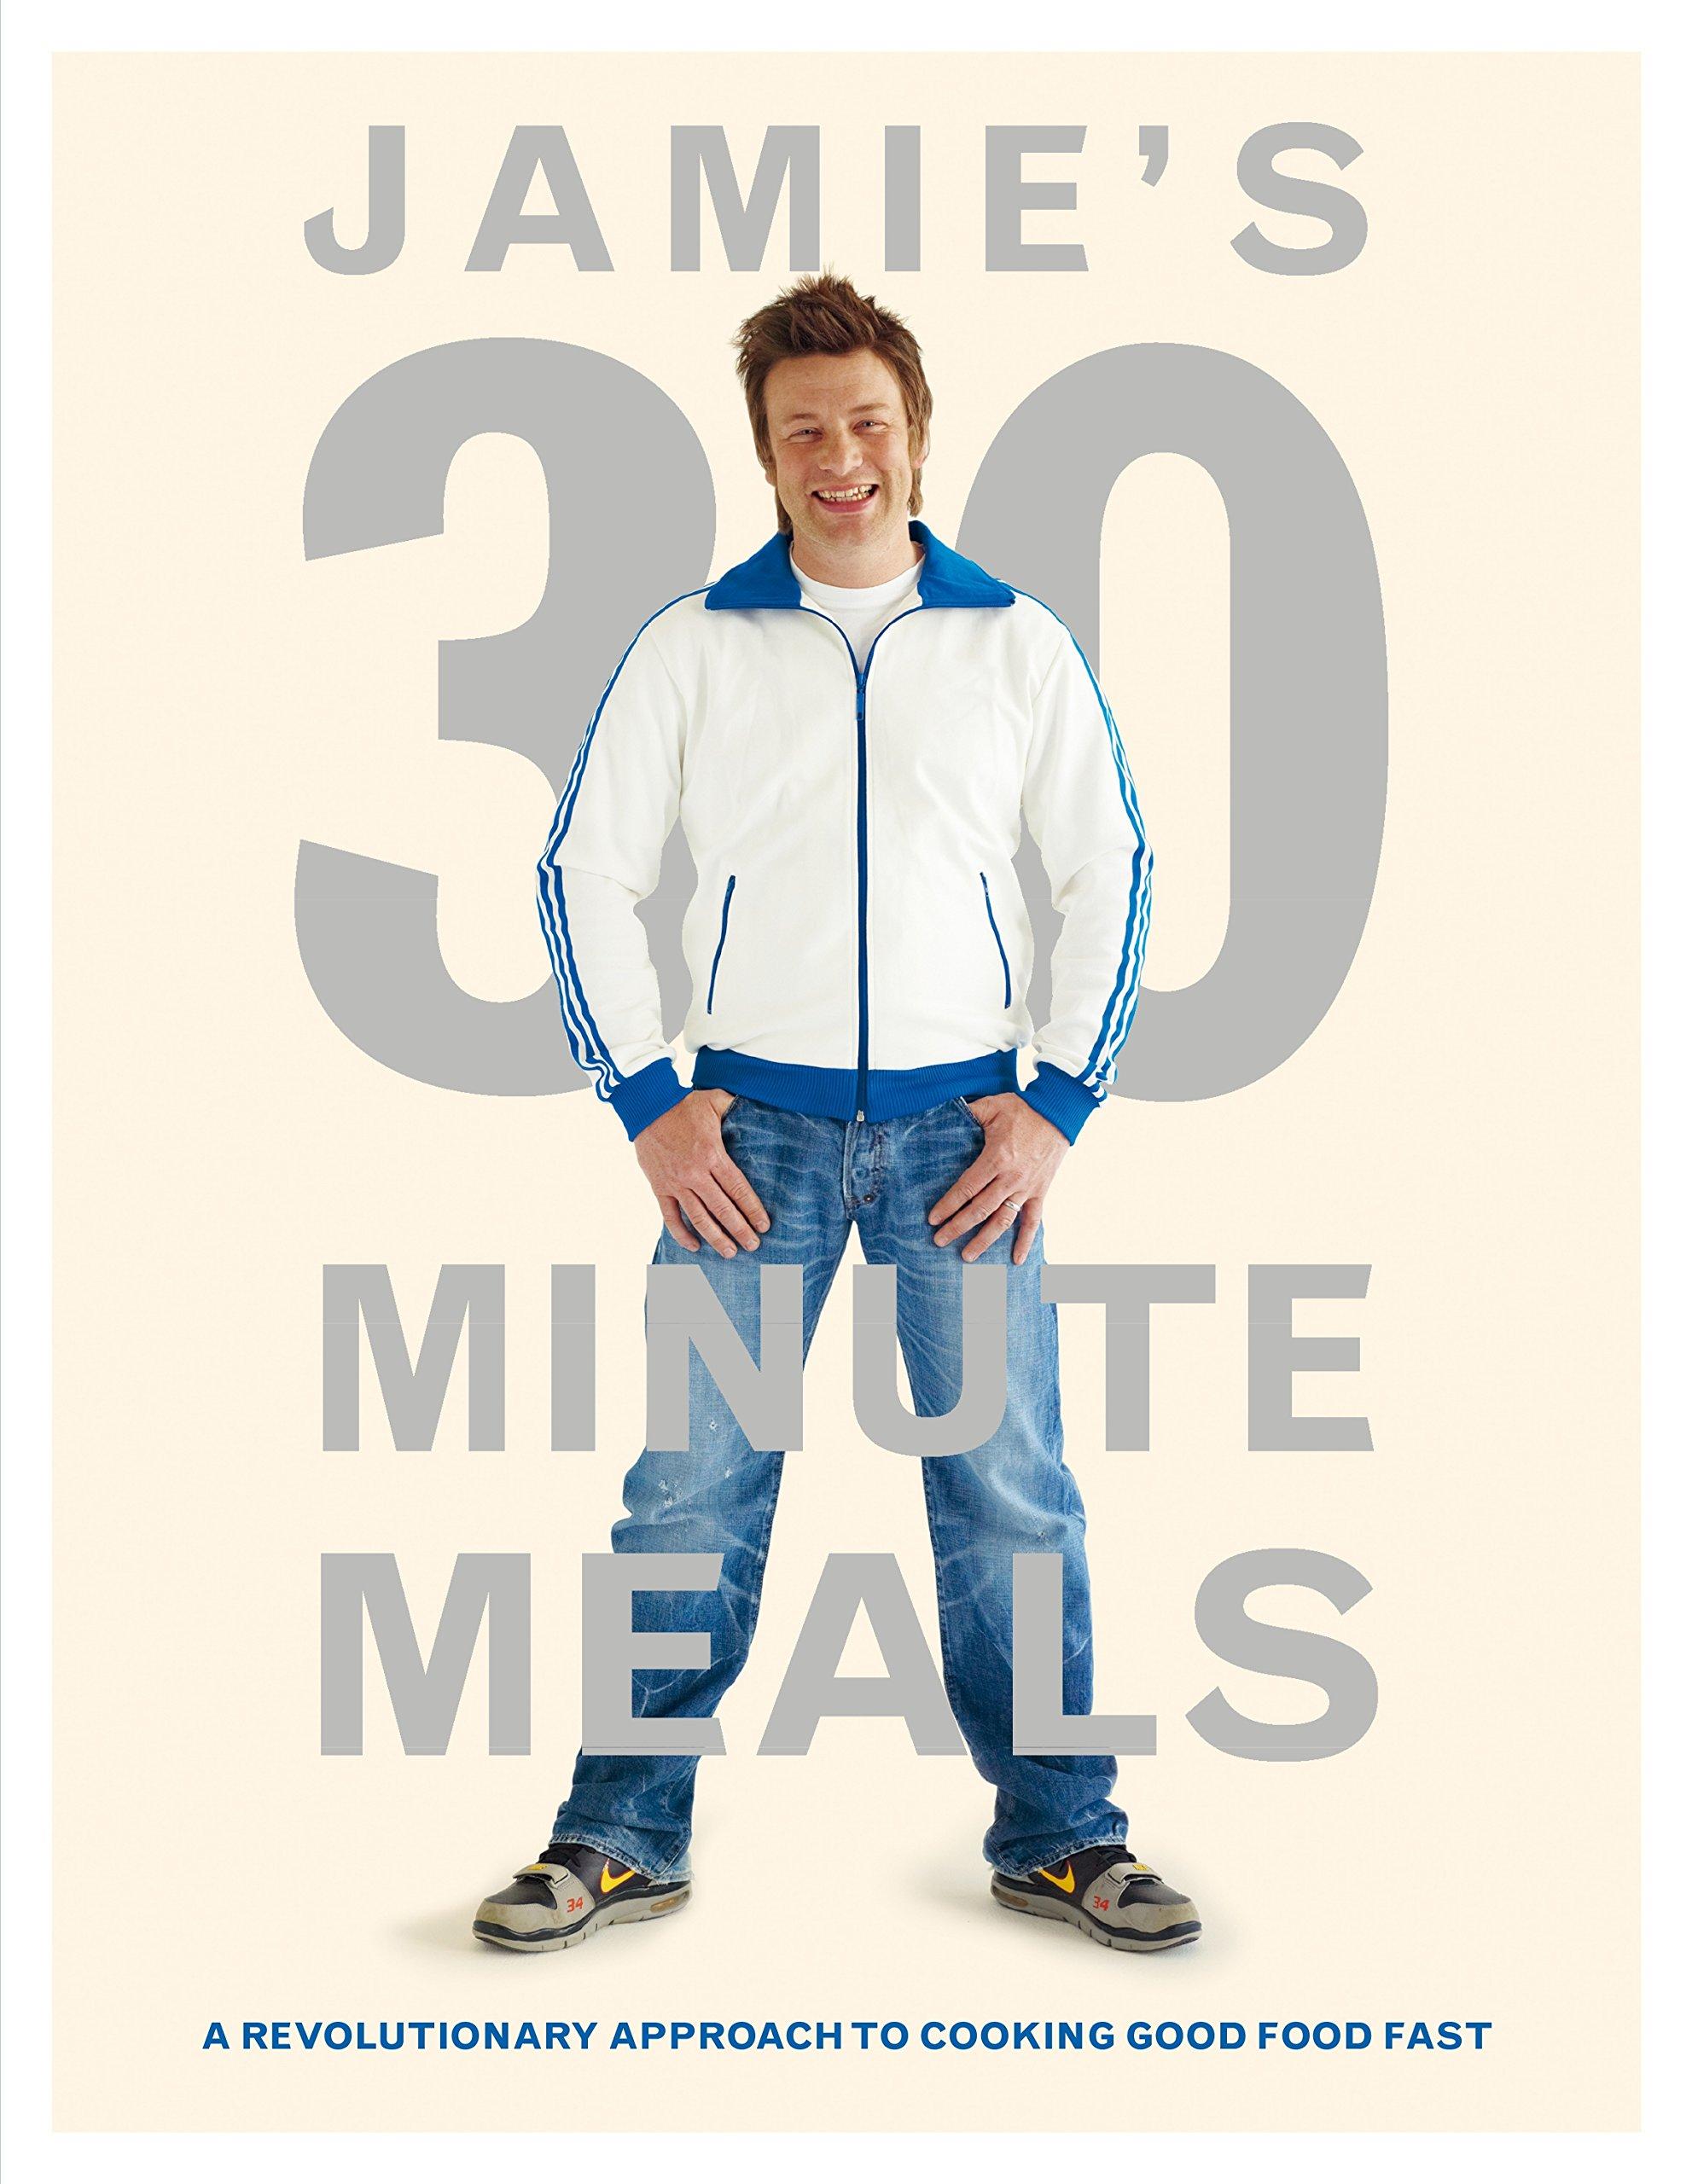 jamie\u0027s 30 minute meals jamie oliver, david loftus 8601300396613